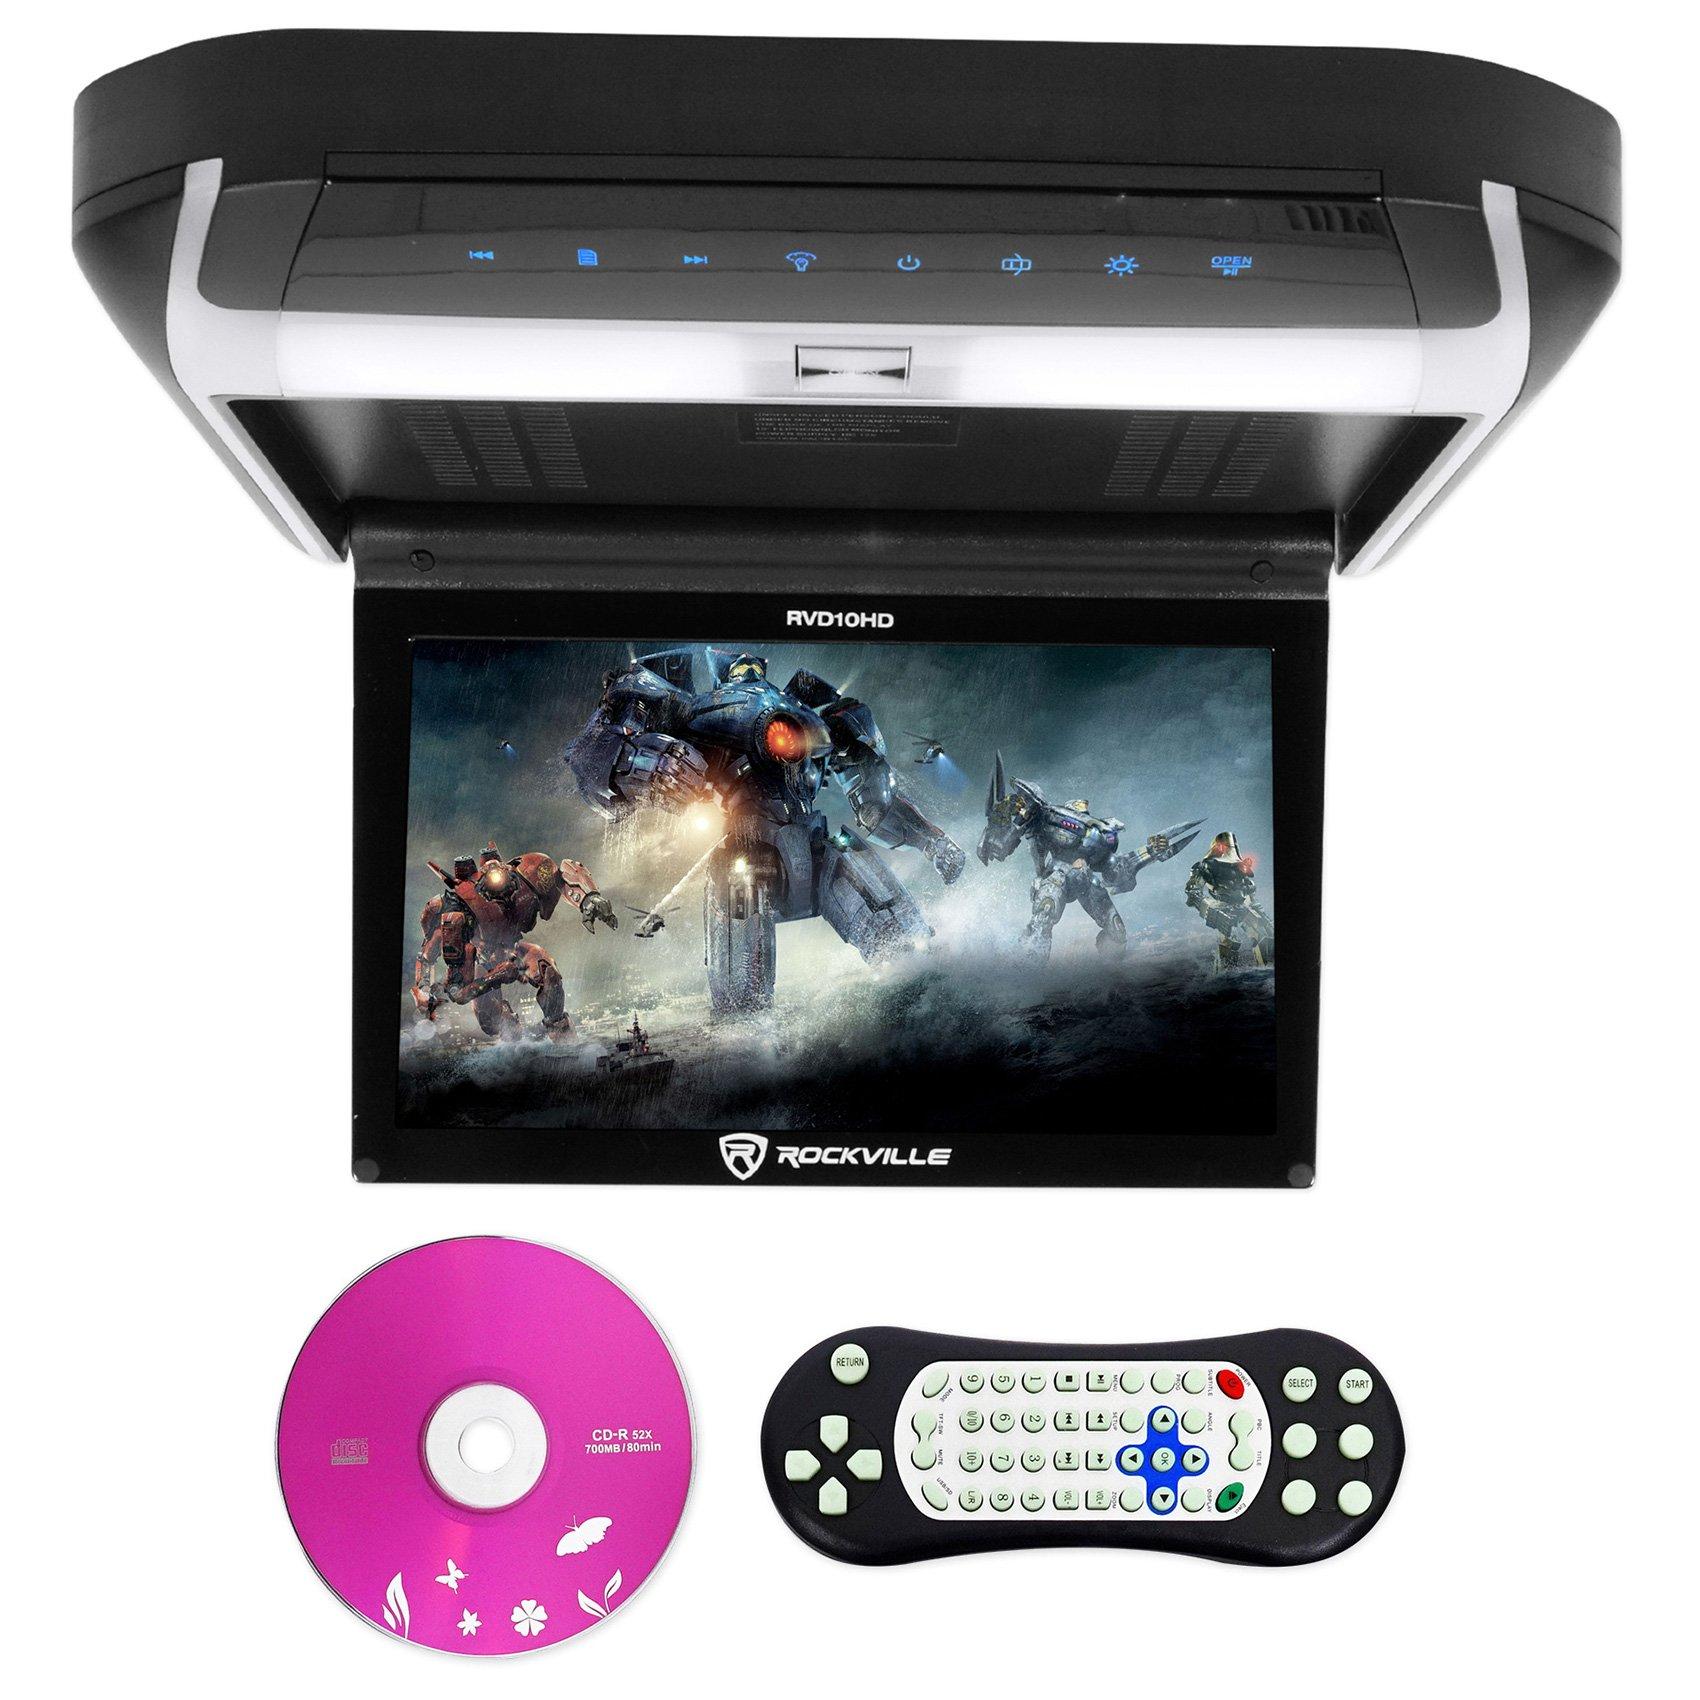 Rockville RVD10HD-BK 10.1'' Flip Down Monitor DVD Player, HDMI, USB, Games, LED by Rockville